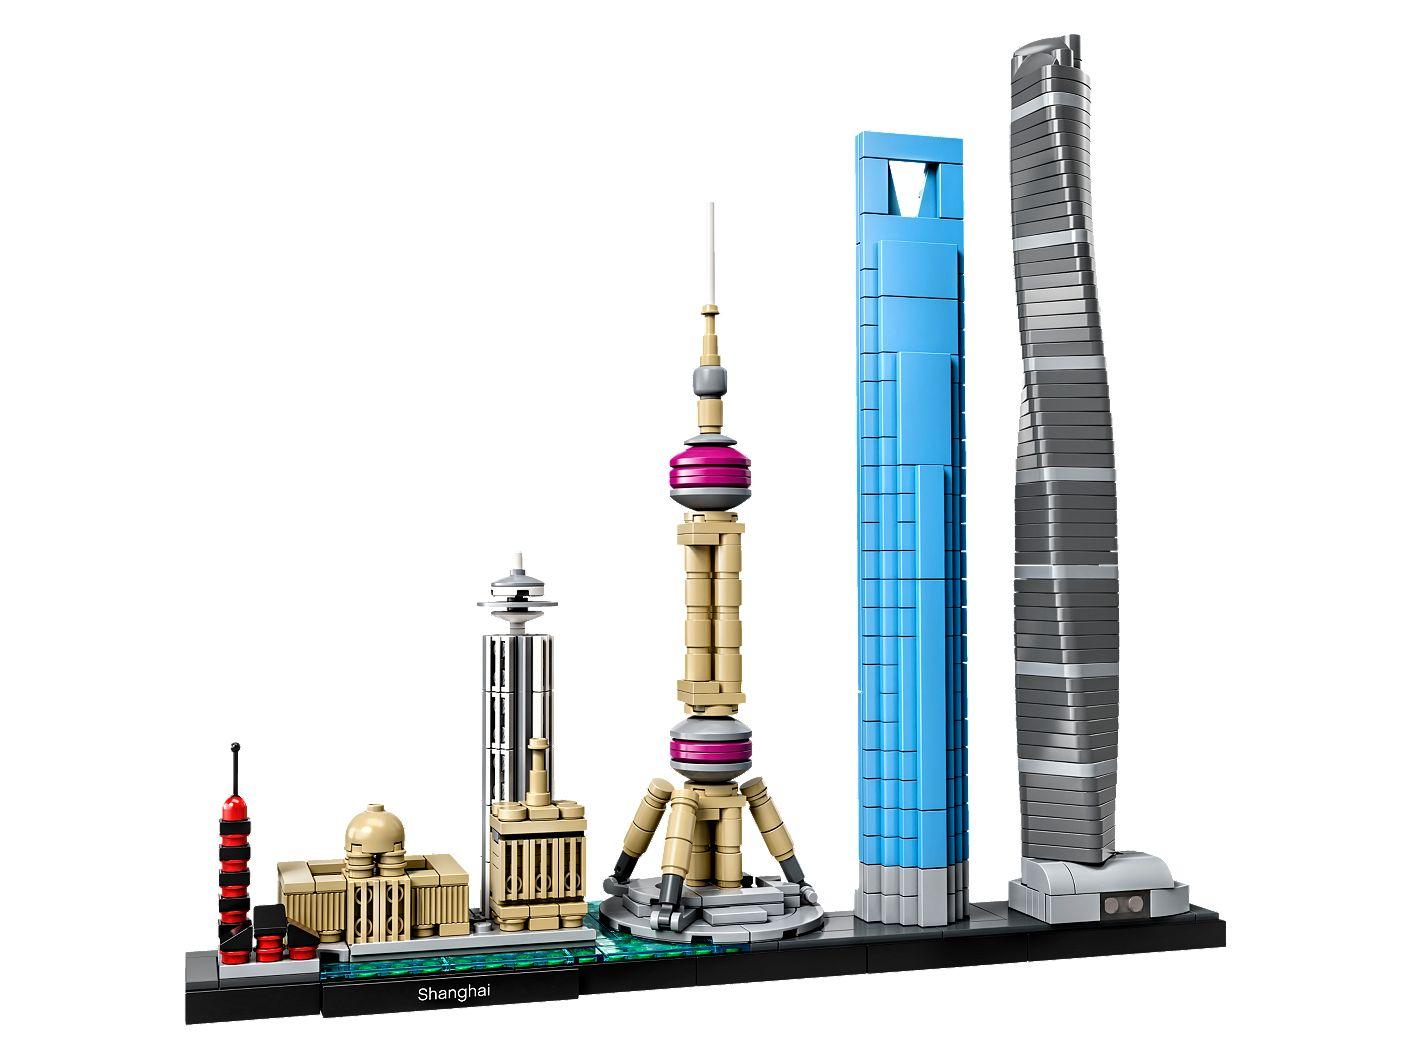 lego shanghai architecture sets skyline tower pearl oriental building australia center build skylines financial amazon features